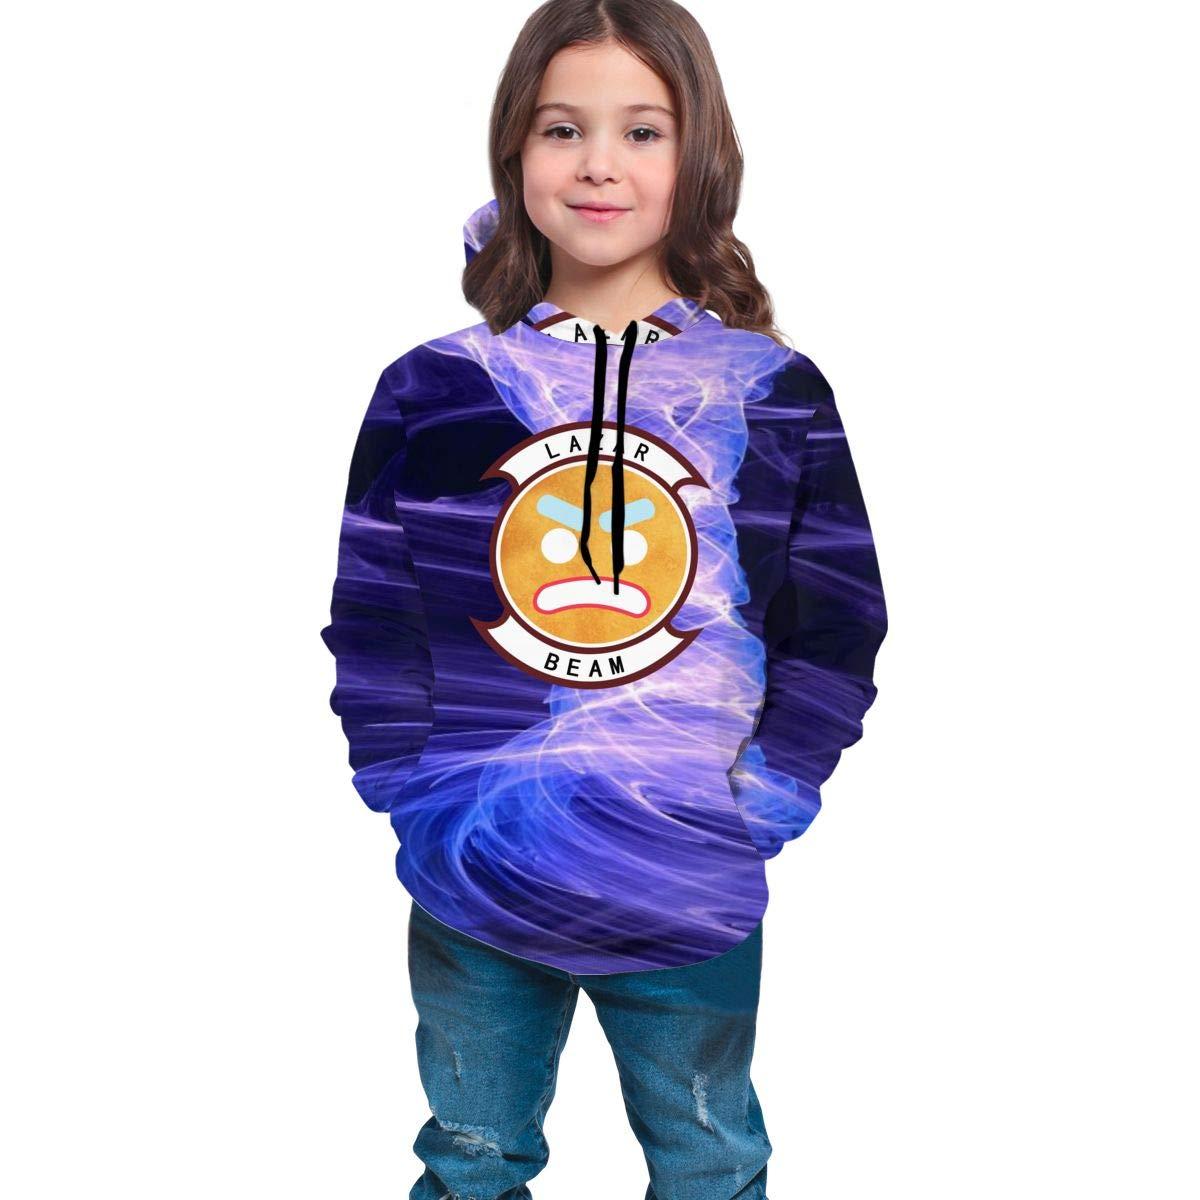 Teen Girls Boys Lazarbeam Logo Hoodie Sweatershirt Long Sleeve Pullover Hoodies for Teens Girls Boys Clothes Black